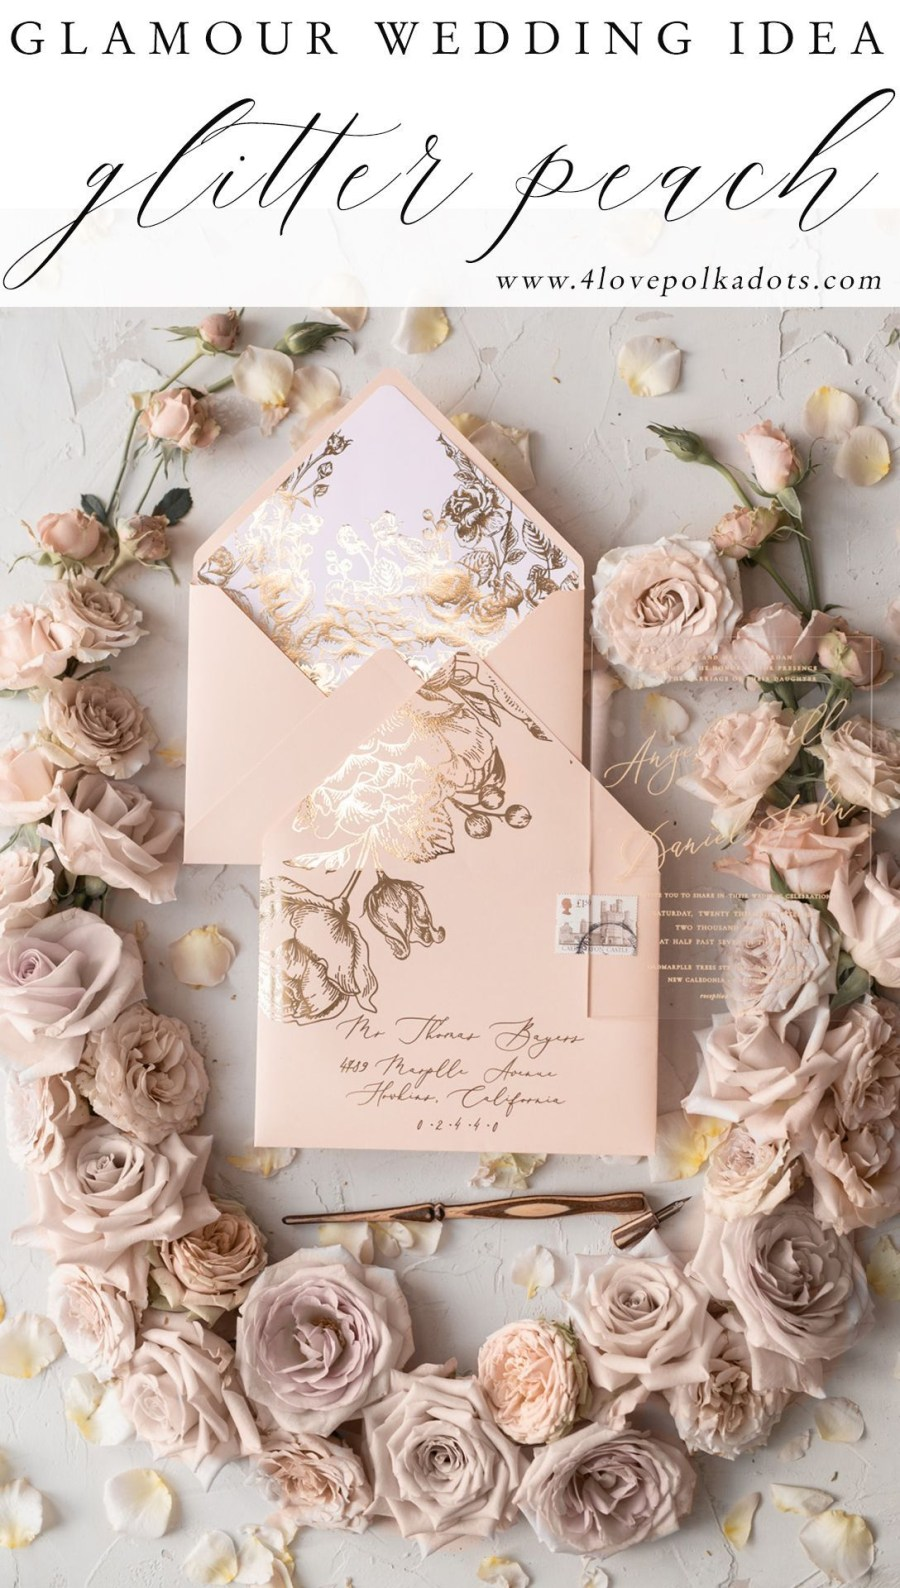 Amazing Wedding Invitations Amazing Wedding Invitations Check This Transparent Wedding